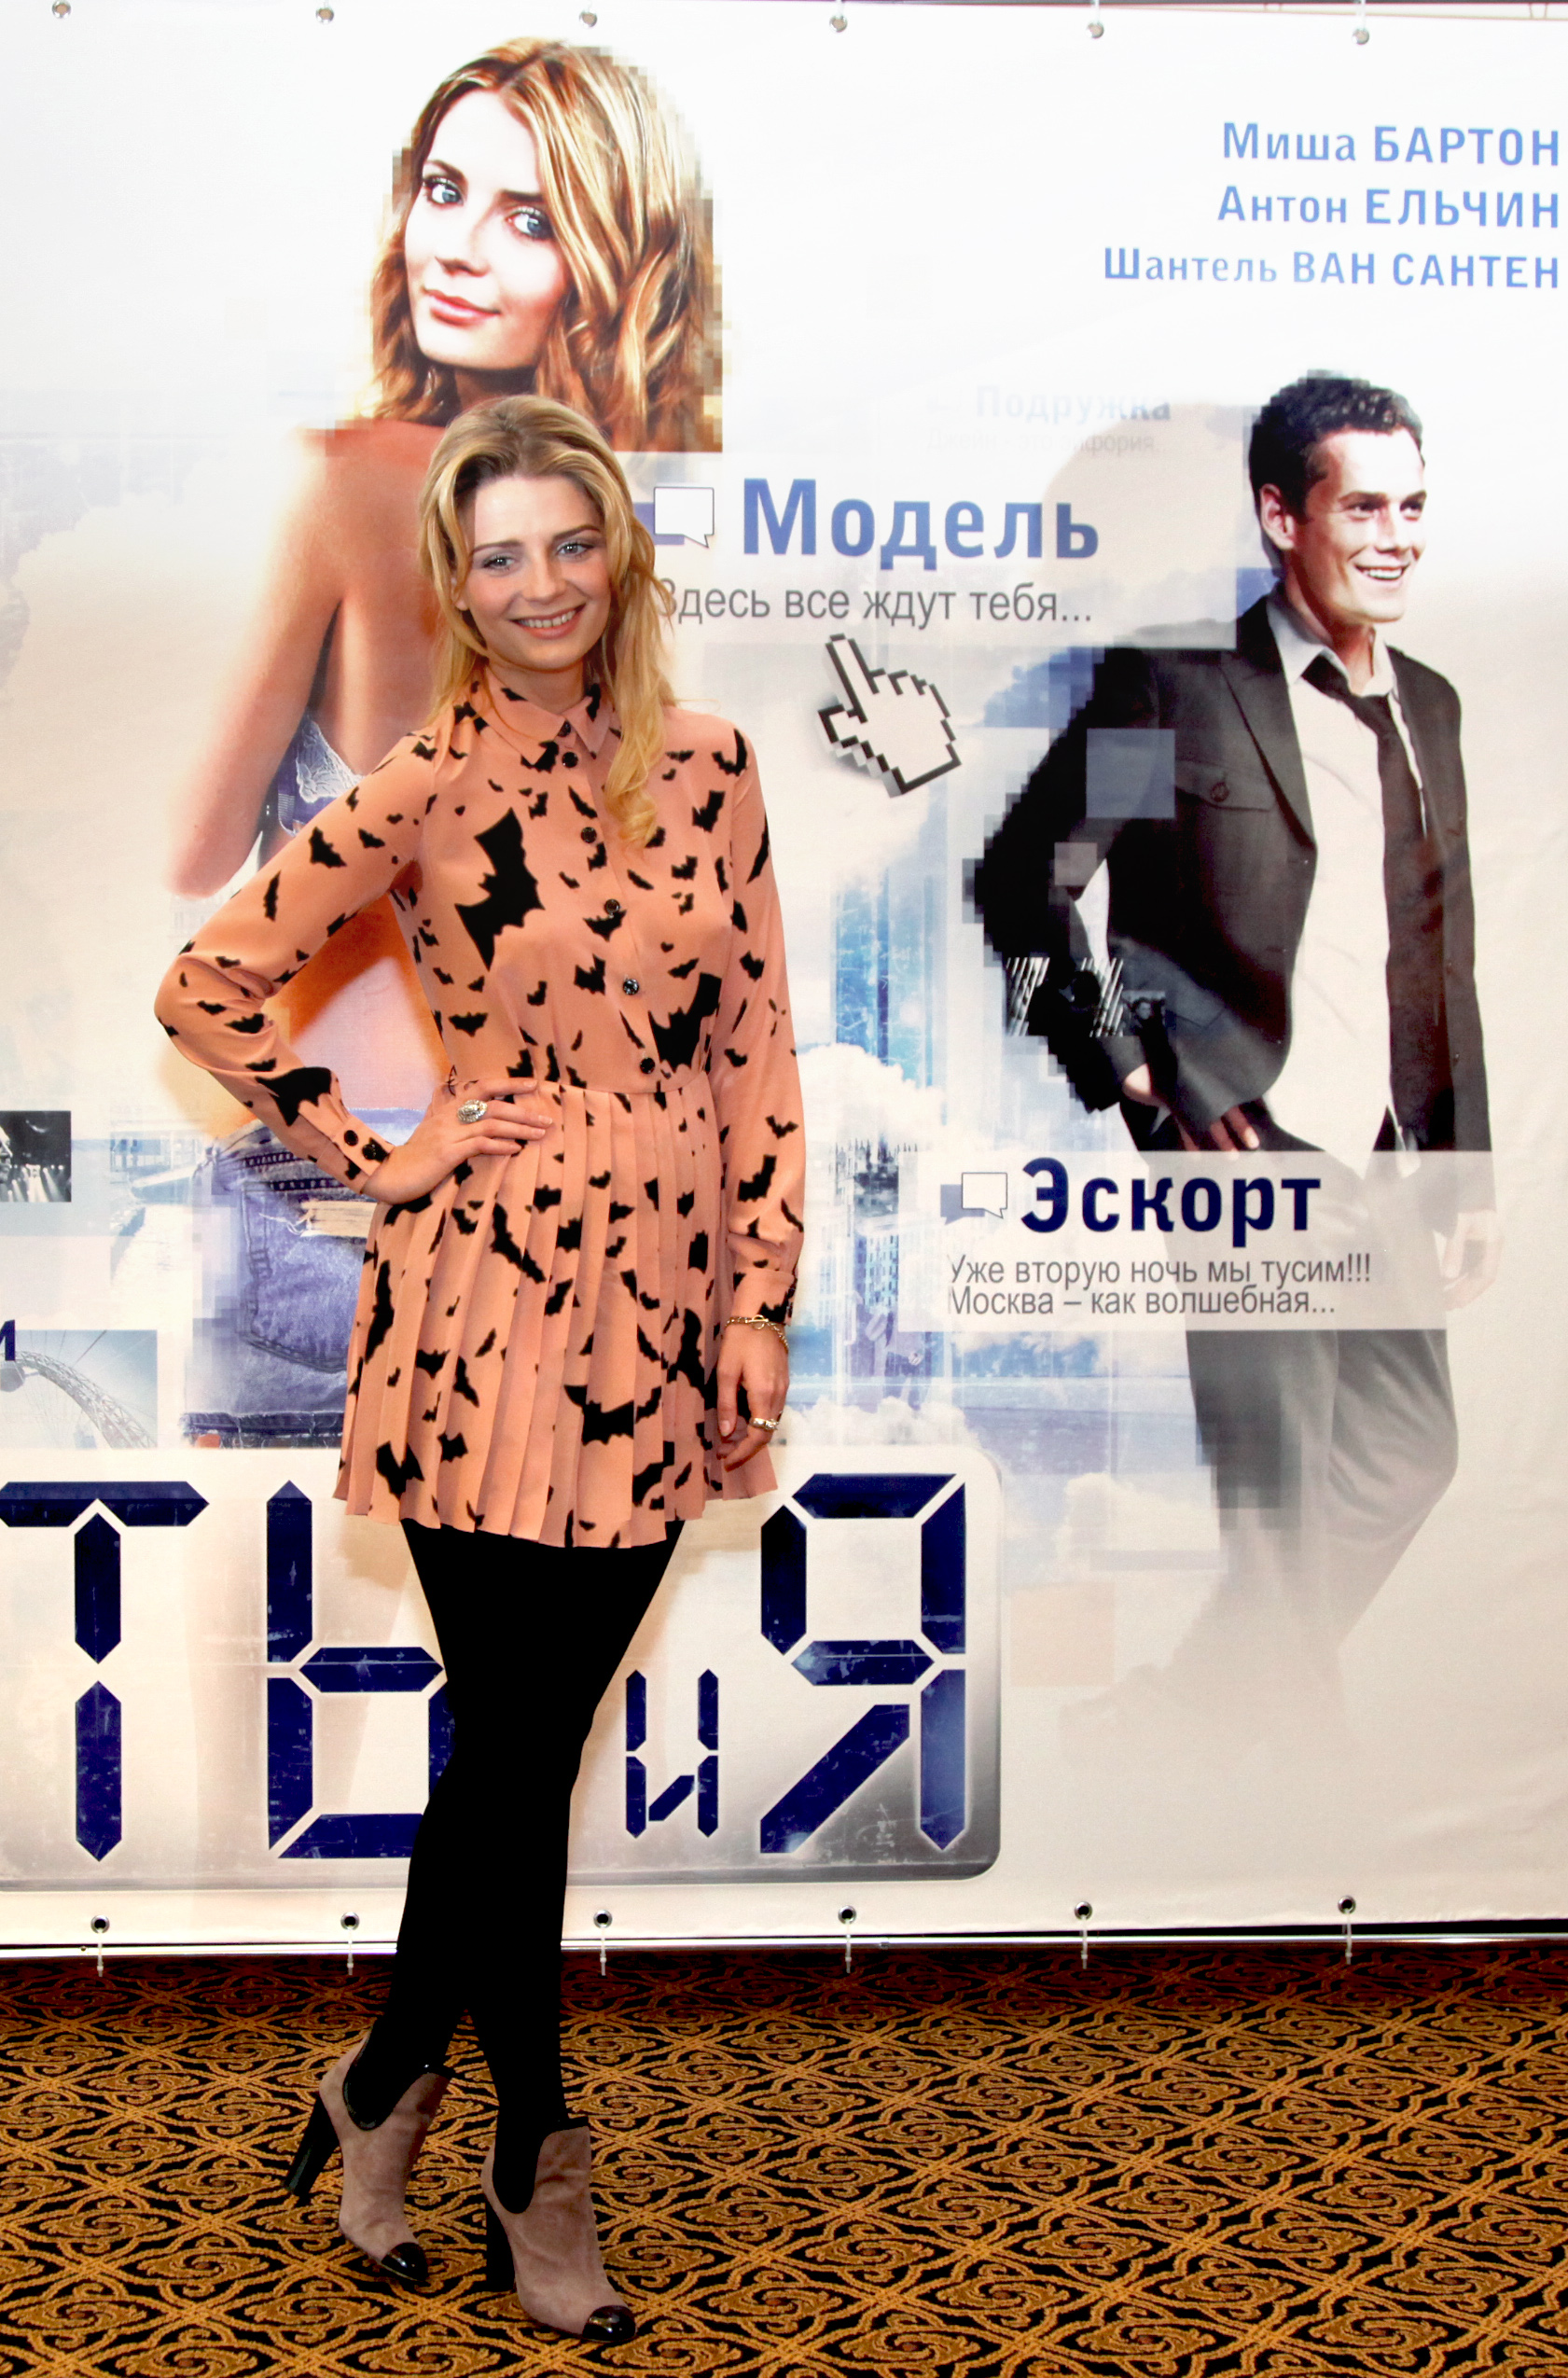 81209_Mischa_Barton_You_and_I_Photocall_PressConference_J0001_010_122_113lo.jpg